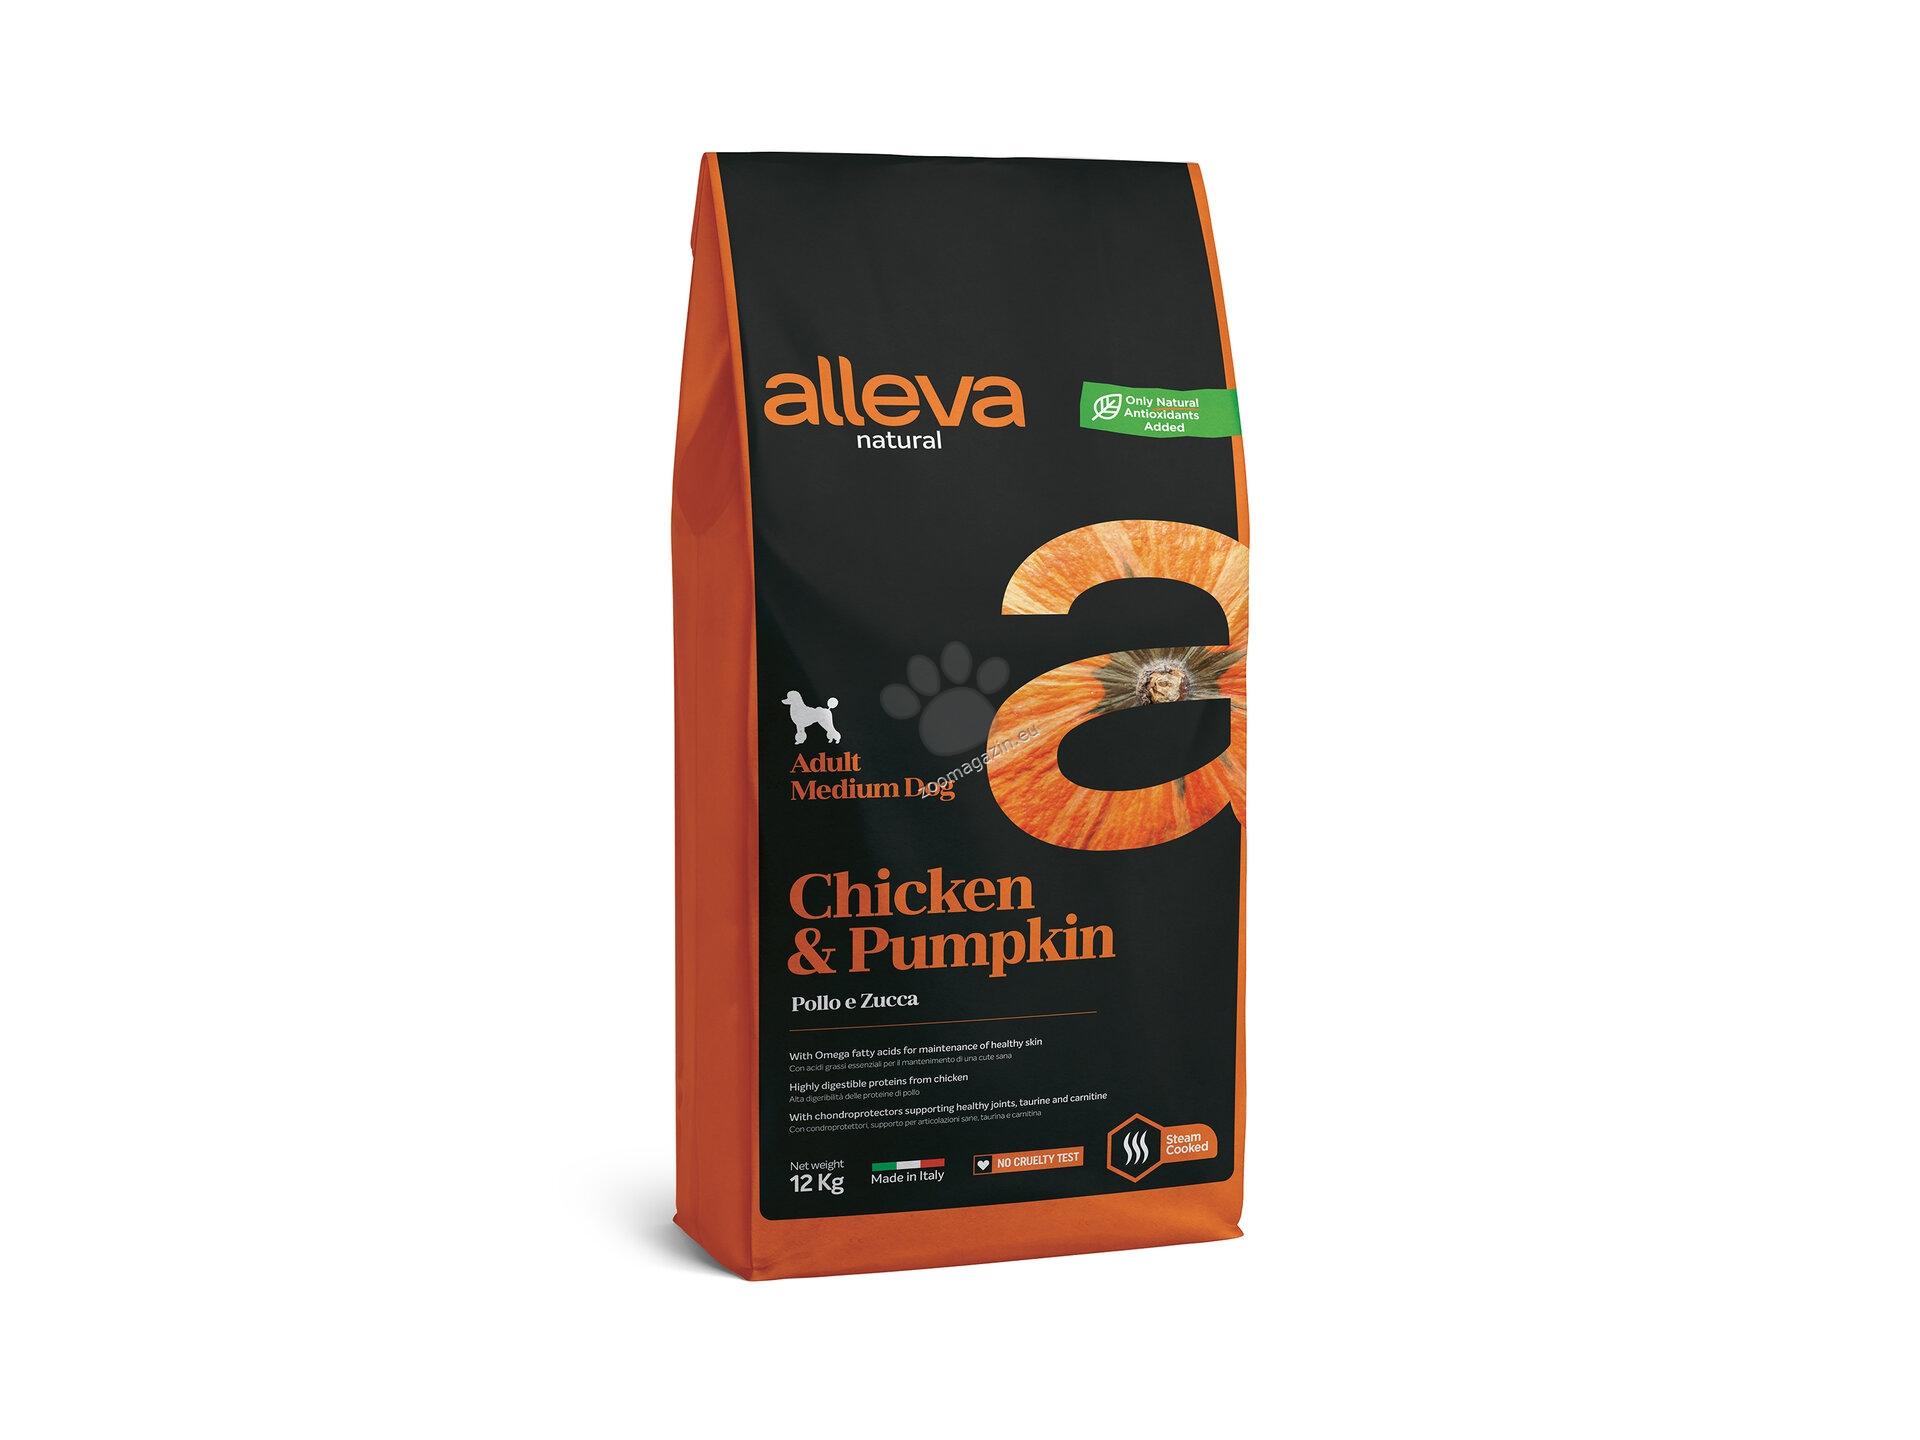 Alleva Natural Adult Medium Chicken & Pumpkin - с пилешко месо, за кучета средни породи / 10-25 кг. / и възраст над 12 месеца 12 кг.